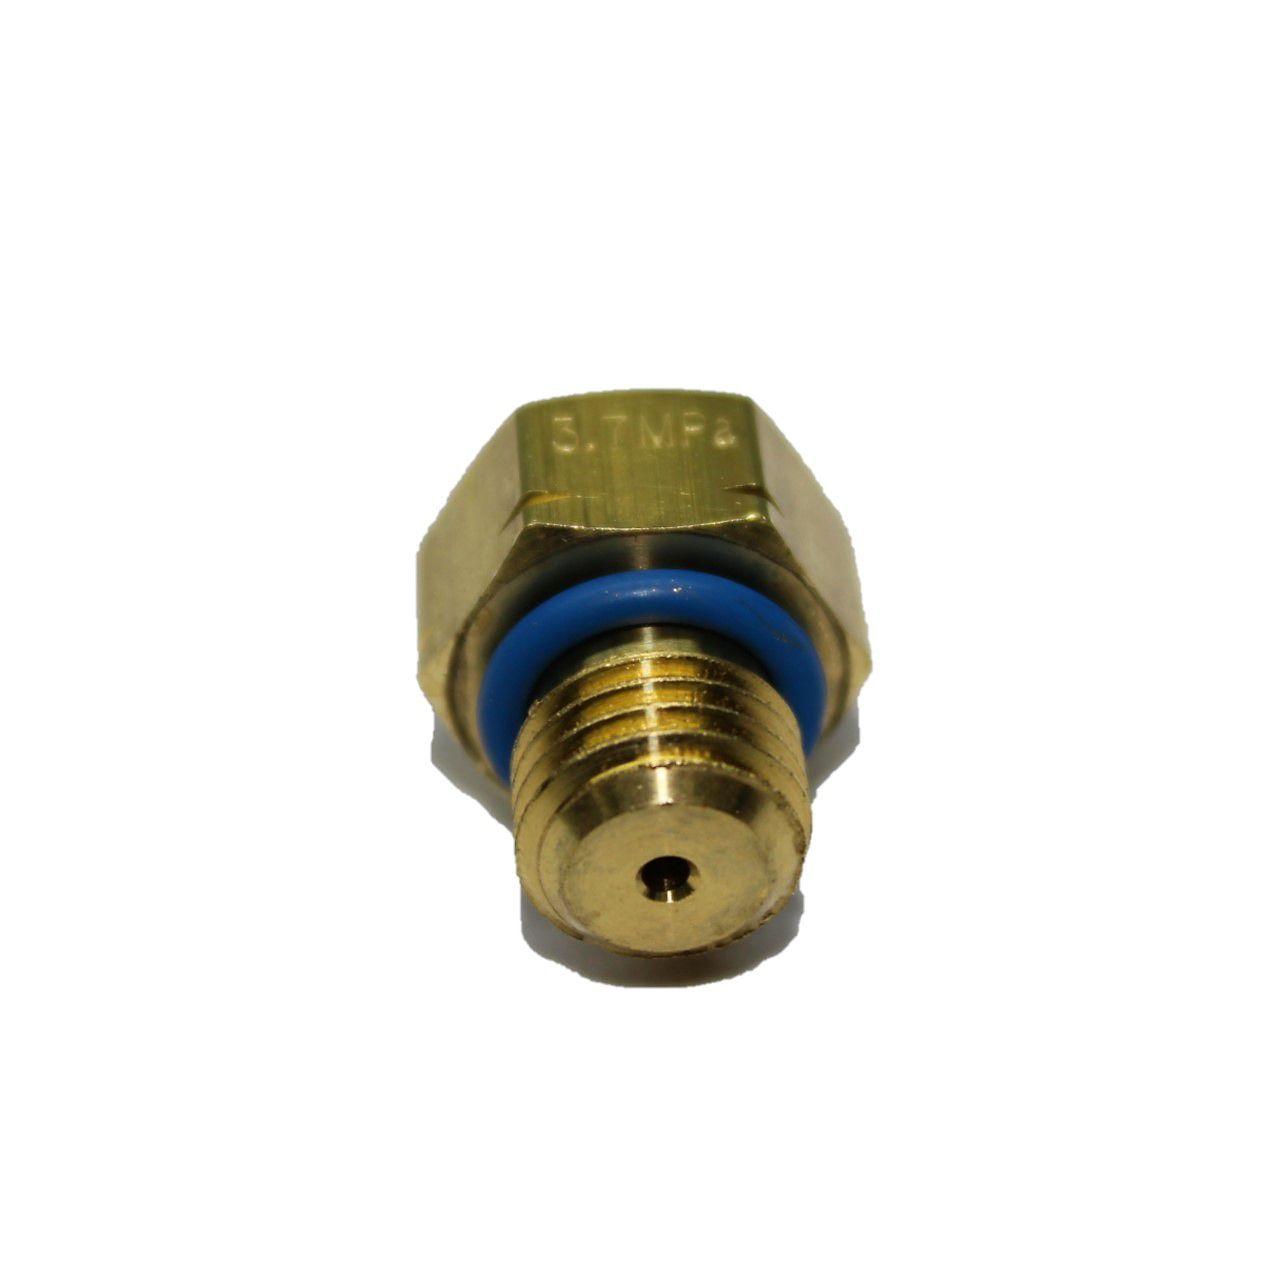 [5 uni] Valvula Sensor Parafuso Alivio Mahle CVC Astra, Vectra, meriva, Fiat 1.8